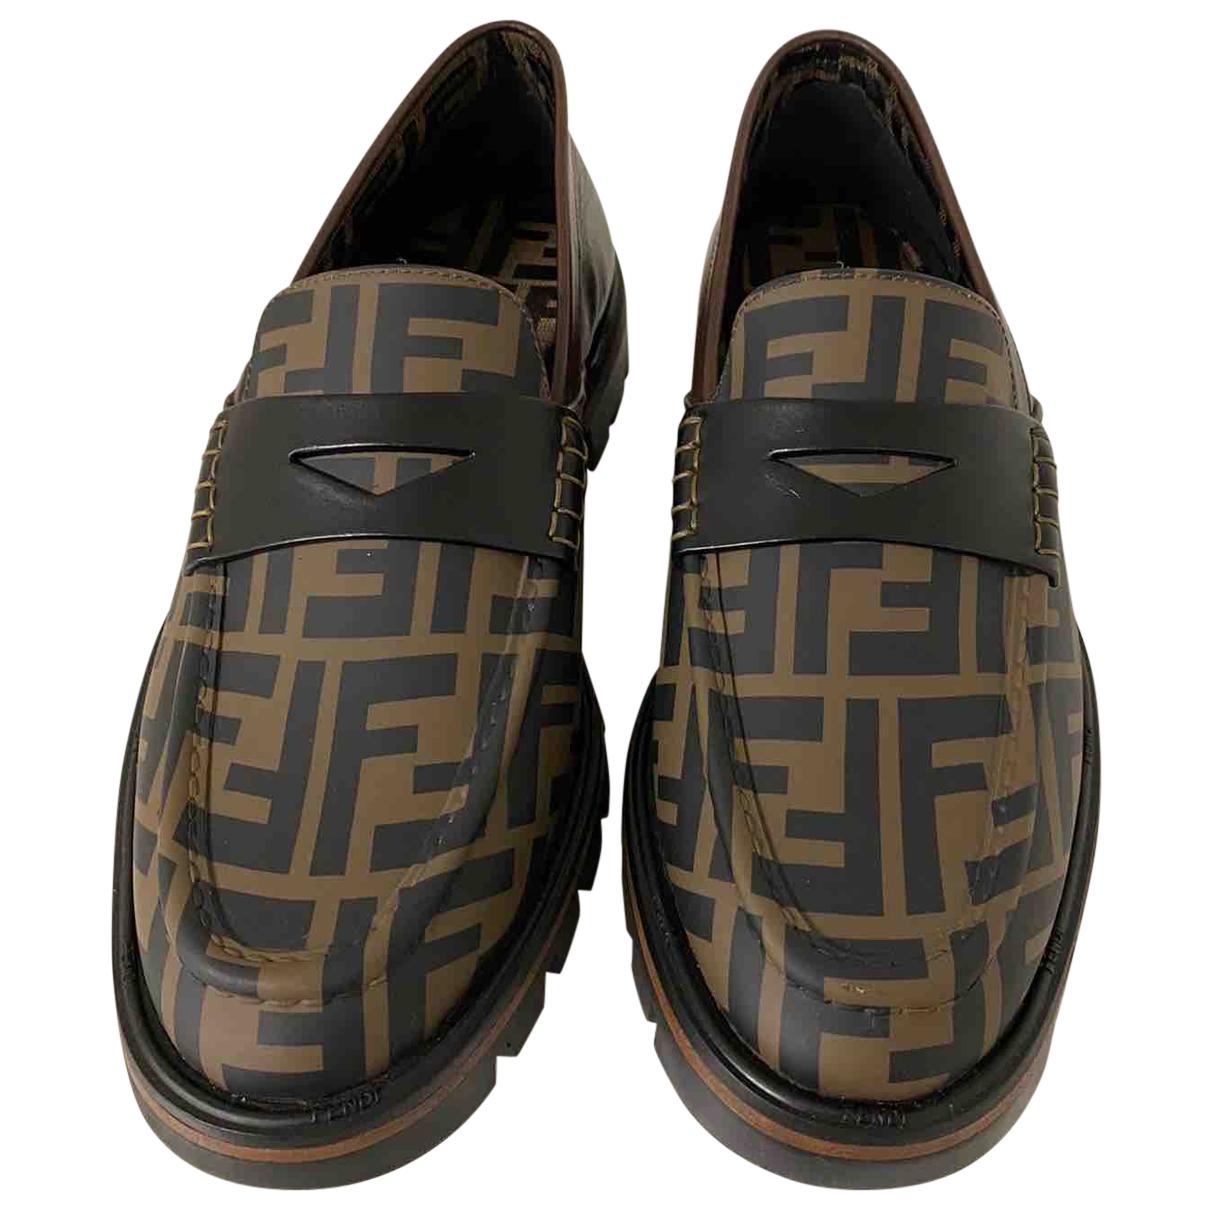 Fendi N Brown Leather Flats for Men 43 EU